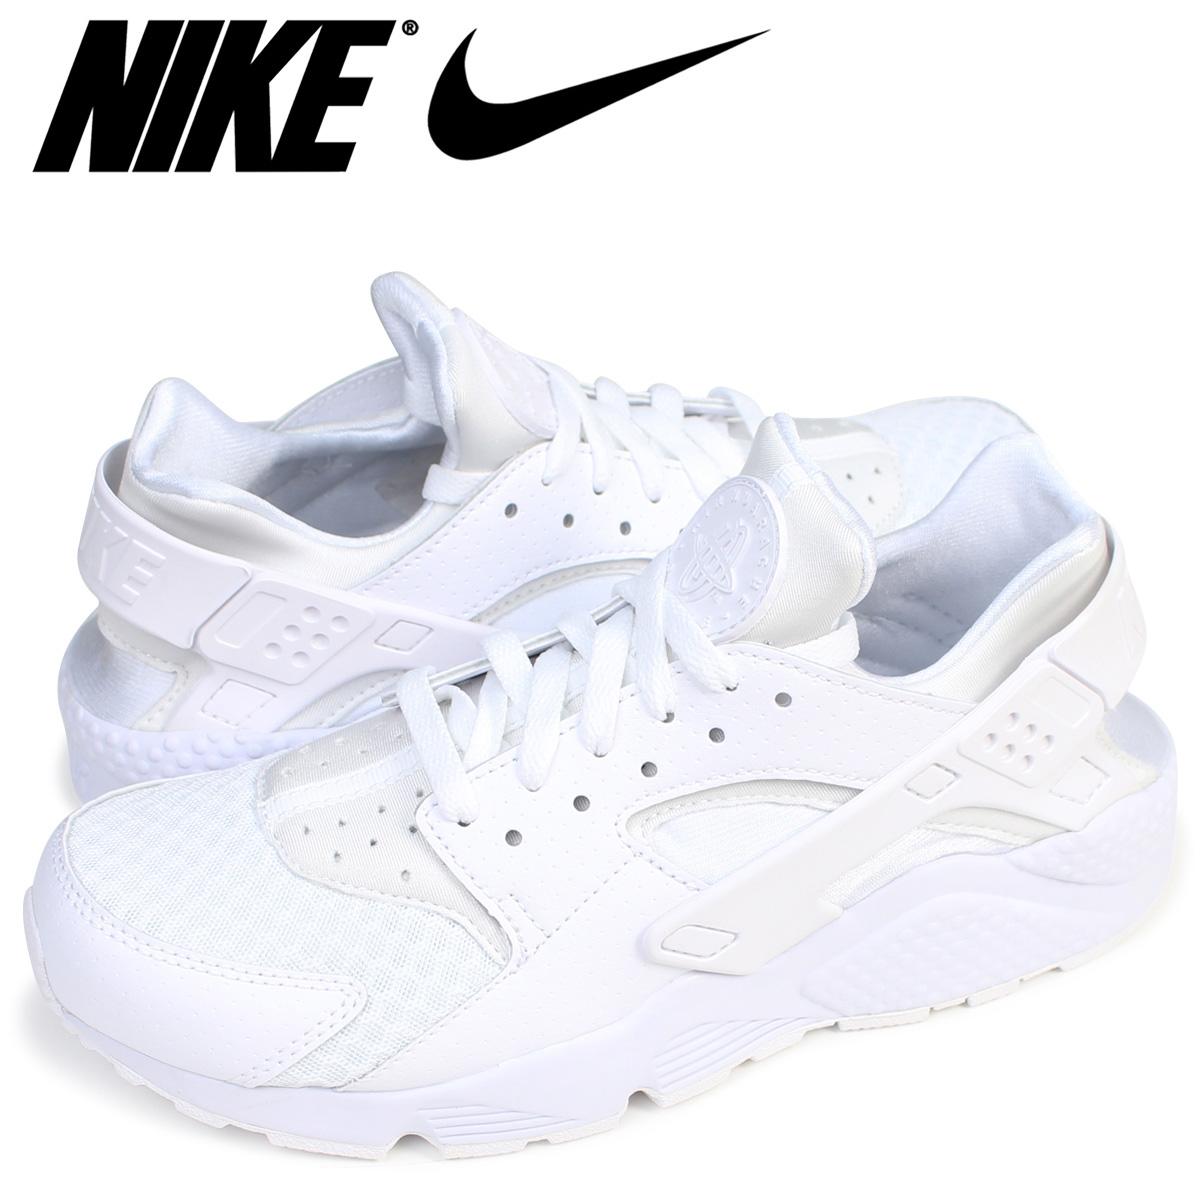 quality design deb1a 0bdb0 Whats up Sports  Nike NIKE エアハラチスニーカー AIR HUARACHE 318,429-111 men s shoes  white  7 8 Shinnyu load    Rakuten Global Market